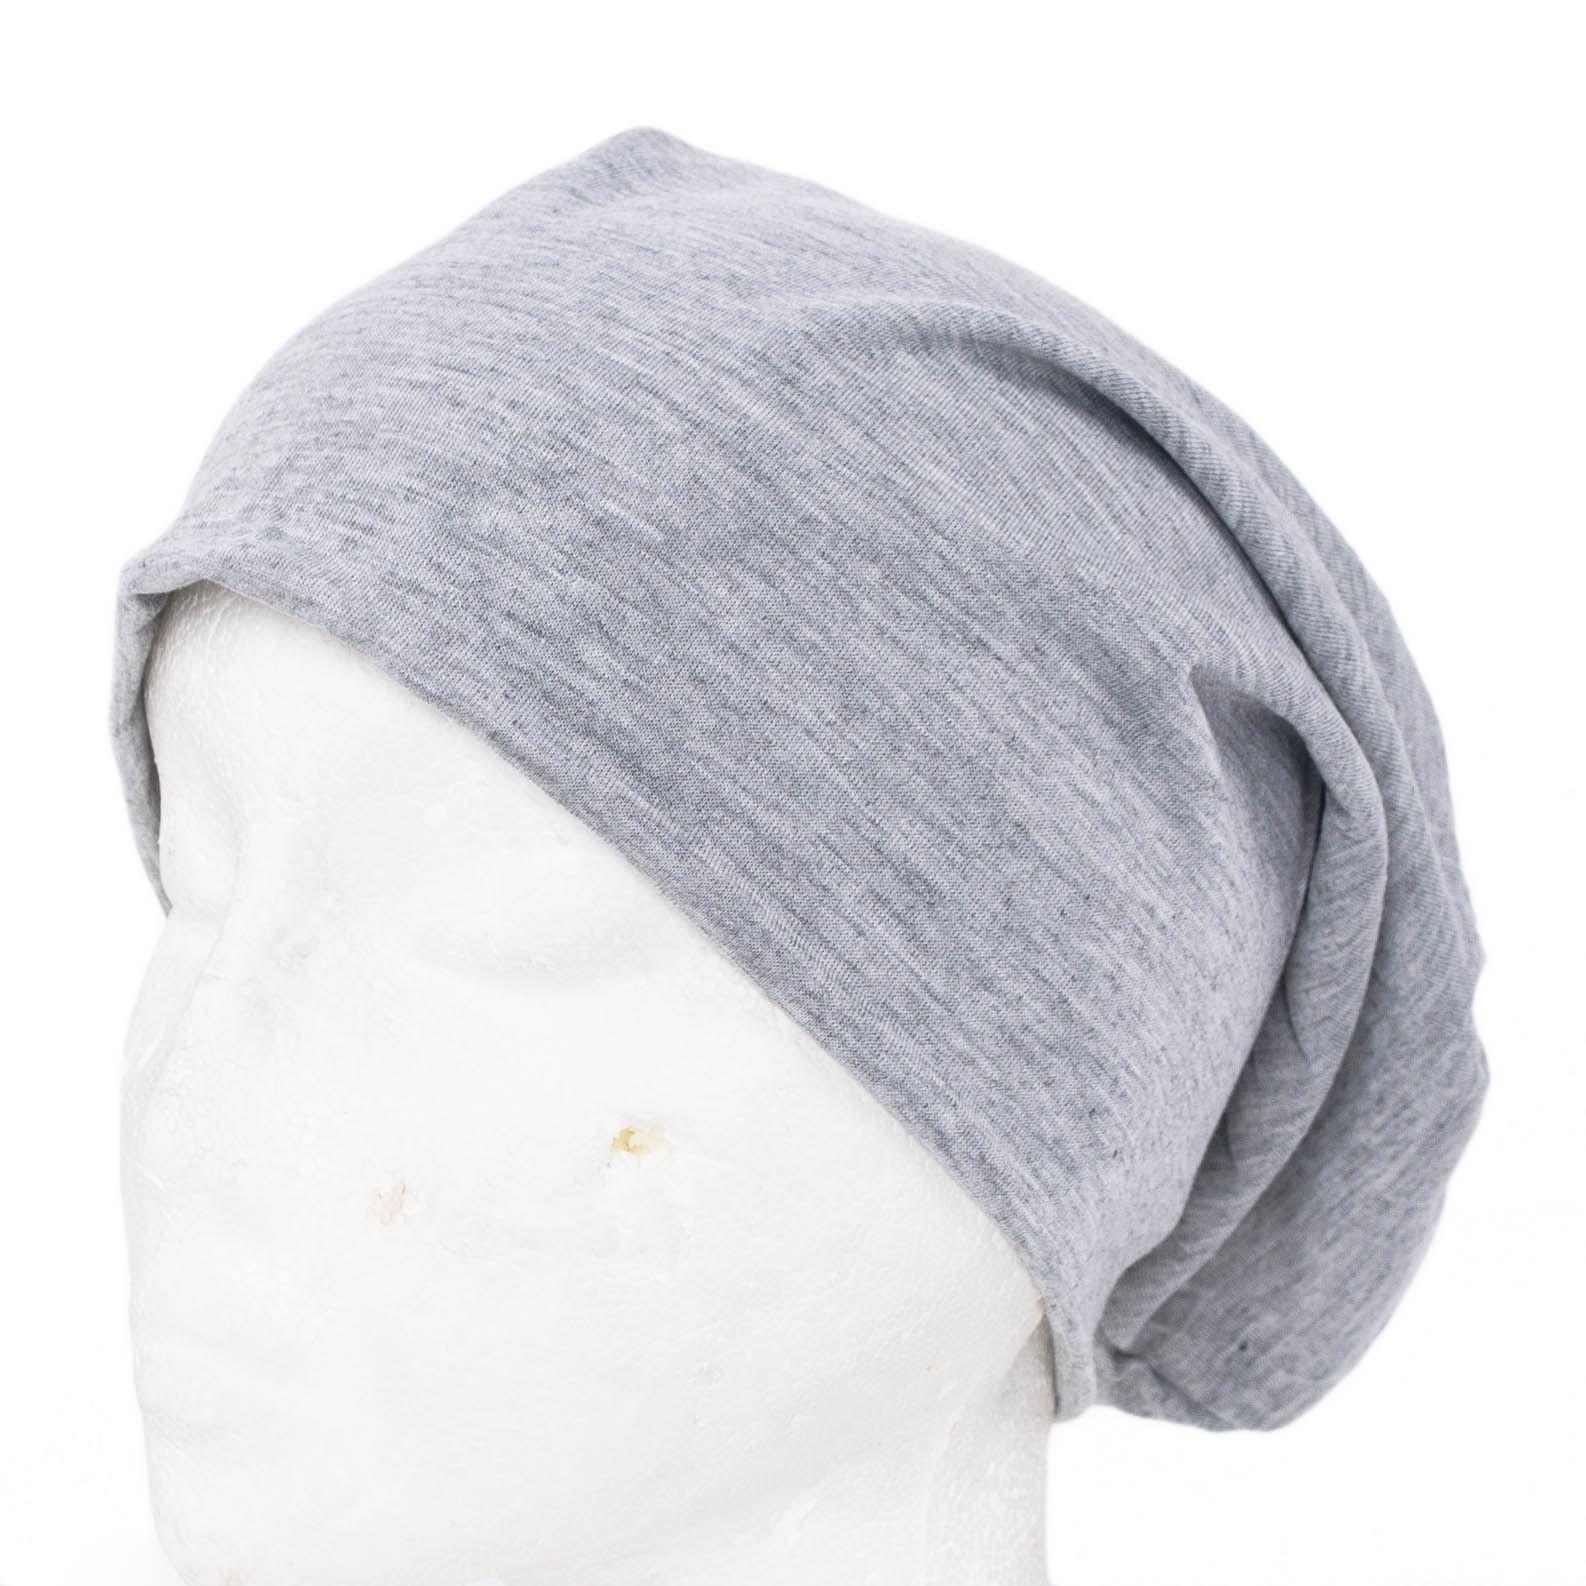 homme femme bonnet chapeau hiver ski casquette ebay. Black Bedroom Furniture Sets. Home Design Ideas